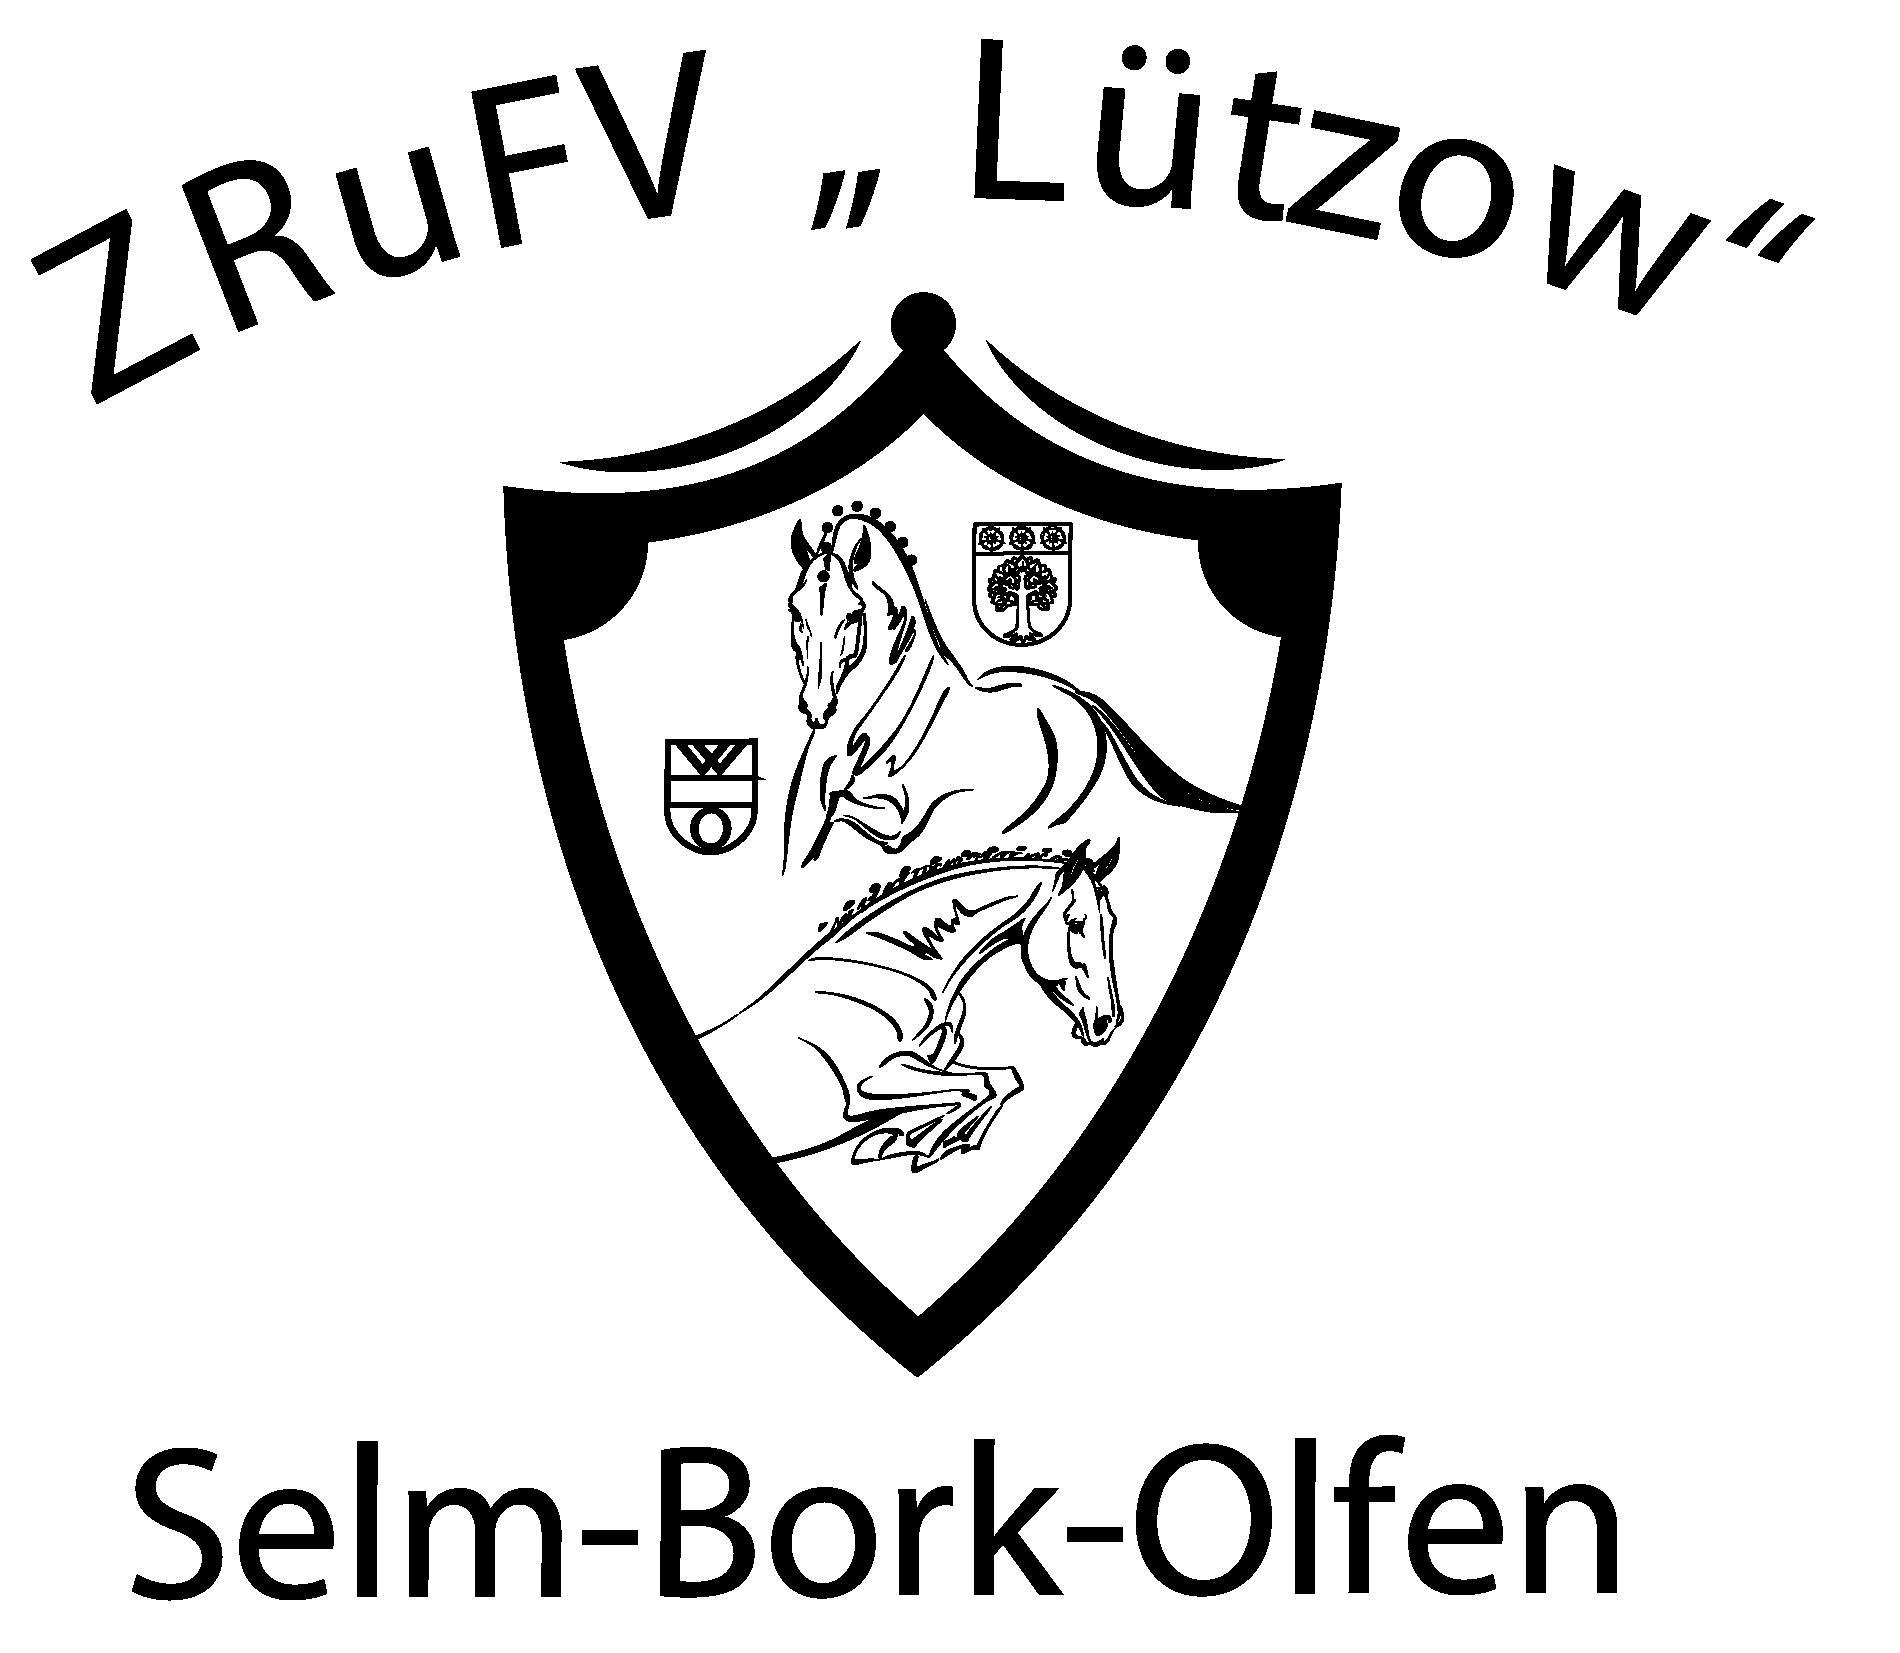 ZRuFV Lützow Selm-Bork-Olfen eV